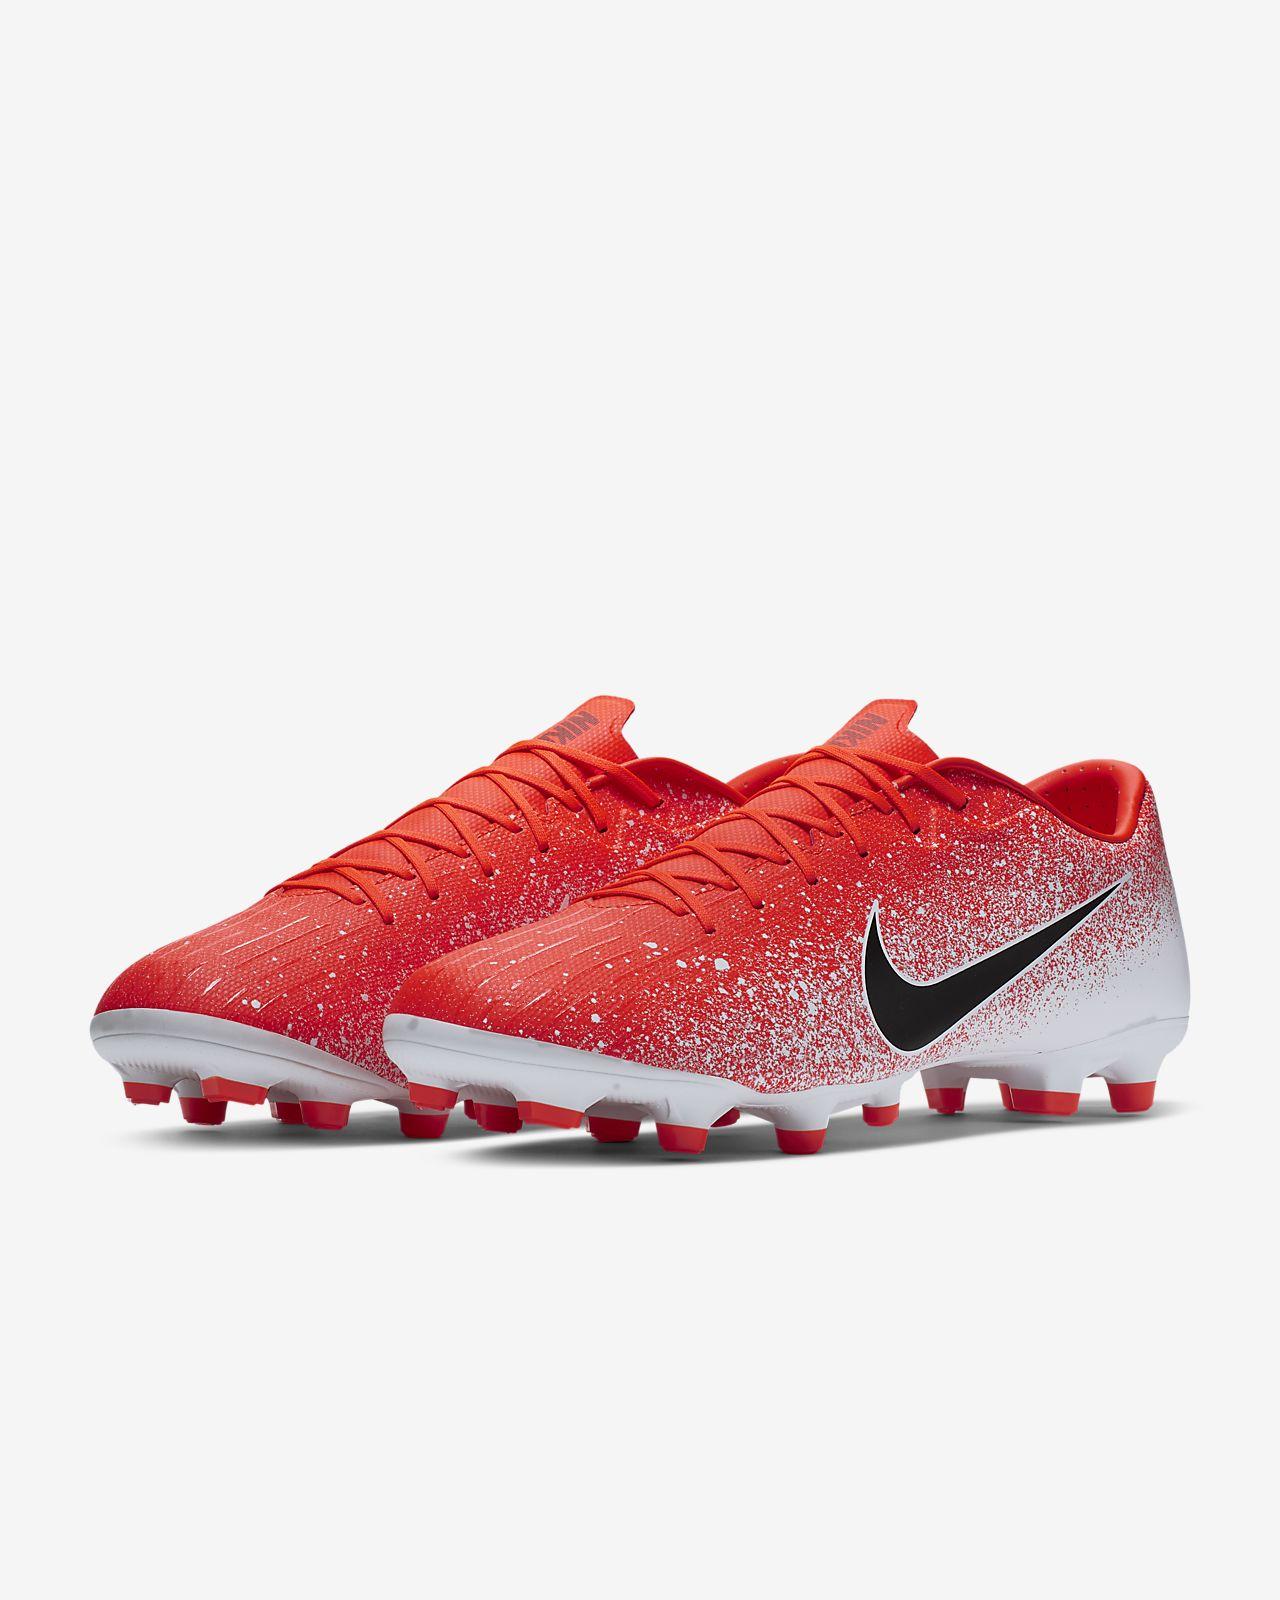 6489abcc8731f ... Calzado de fútbol para múltiples superficies Nike Vapor 12 Academy MG